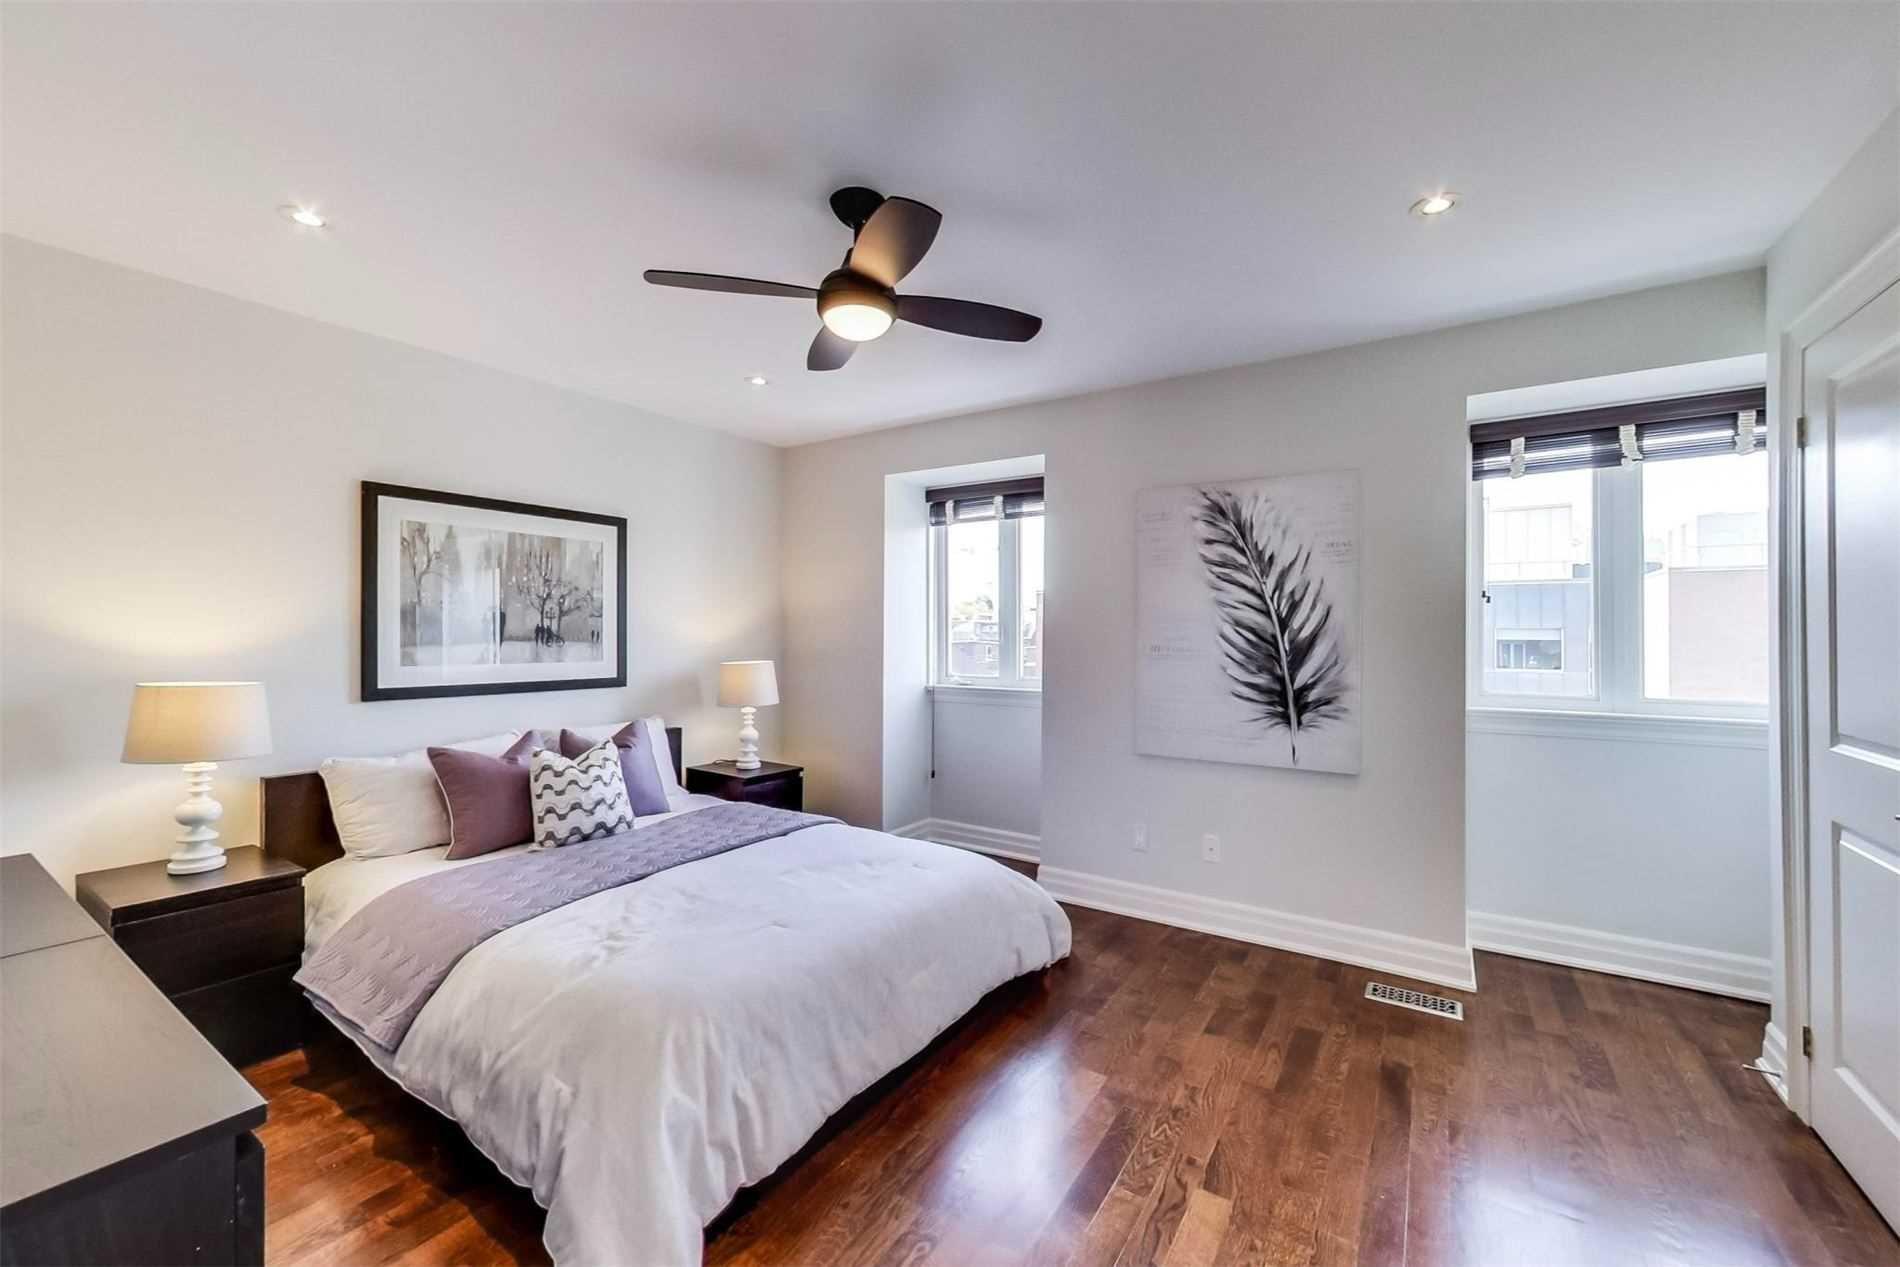 Photo 20: Photos: 213 Heward Avenue in Toronto: South Riverdale House (3-Storey) for sale (Toronto E01)  : MLS®# E4941877